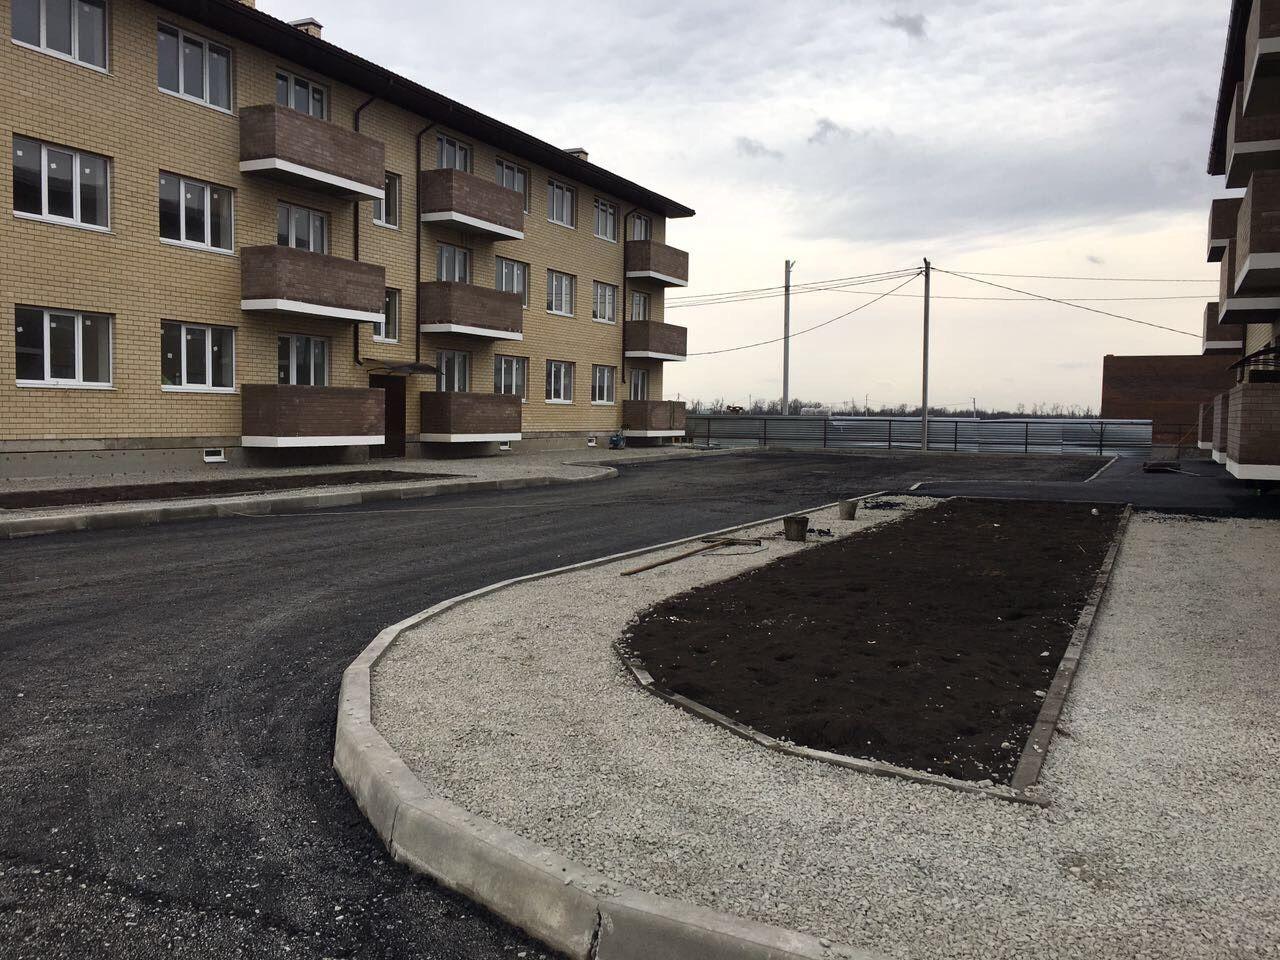 ЖК Оазис, этап 2 Краснодар | фото - 1